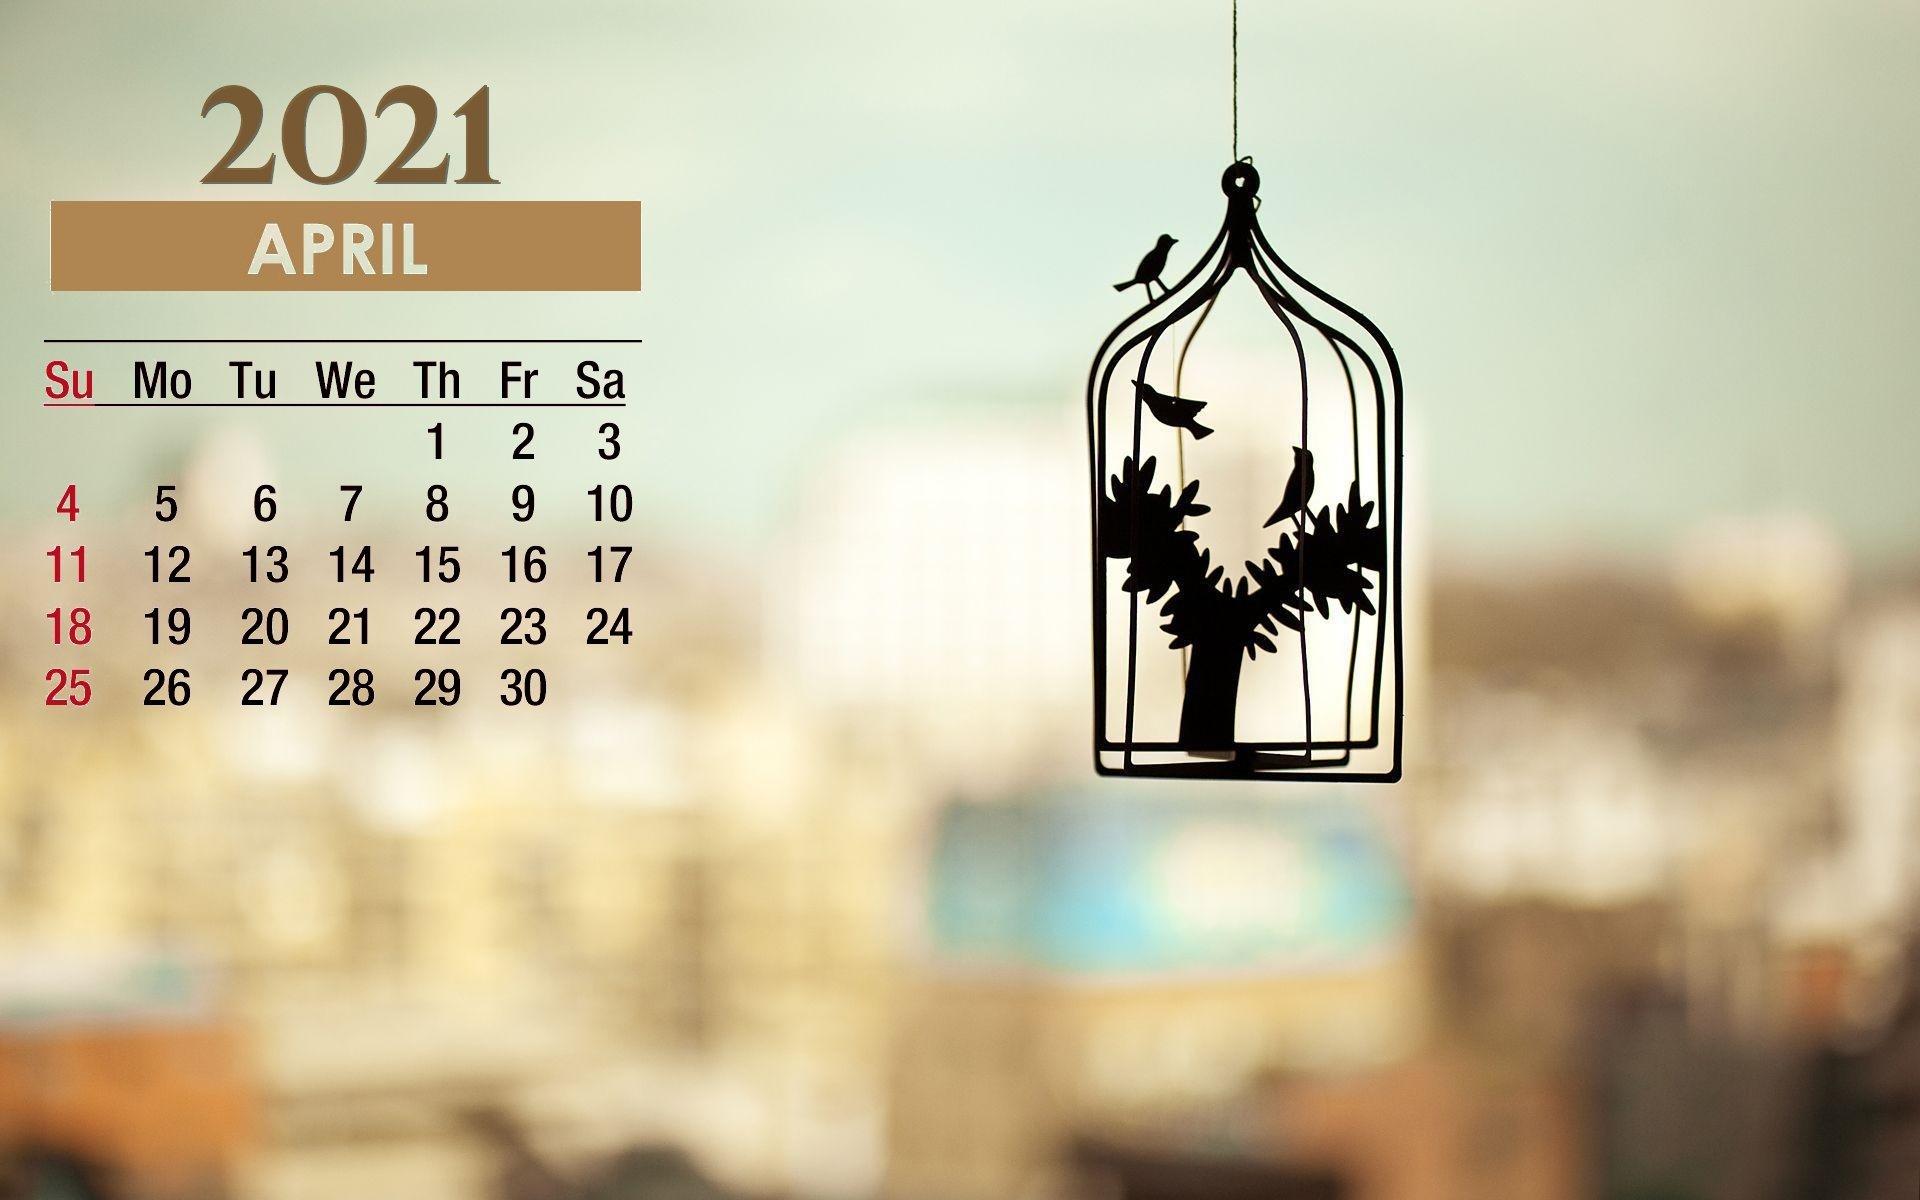 April 2021 Calendar Cage Birds Wallpaper 72163   Baltana 1920x1200